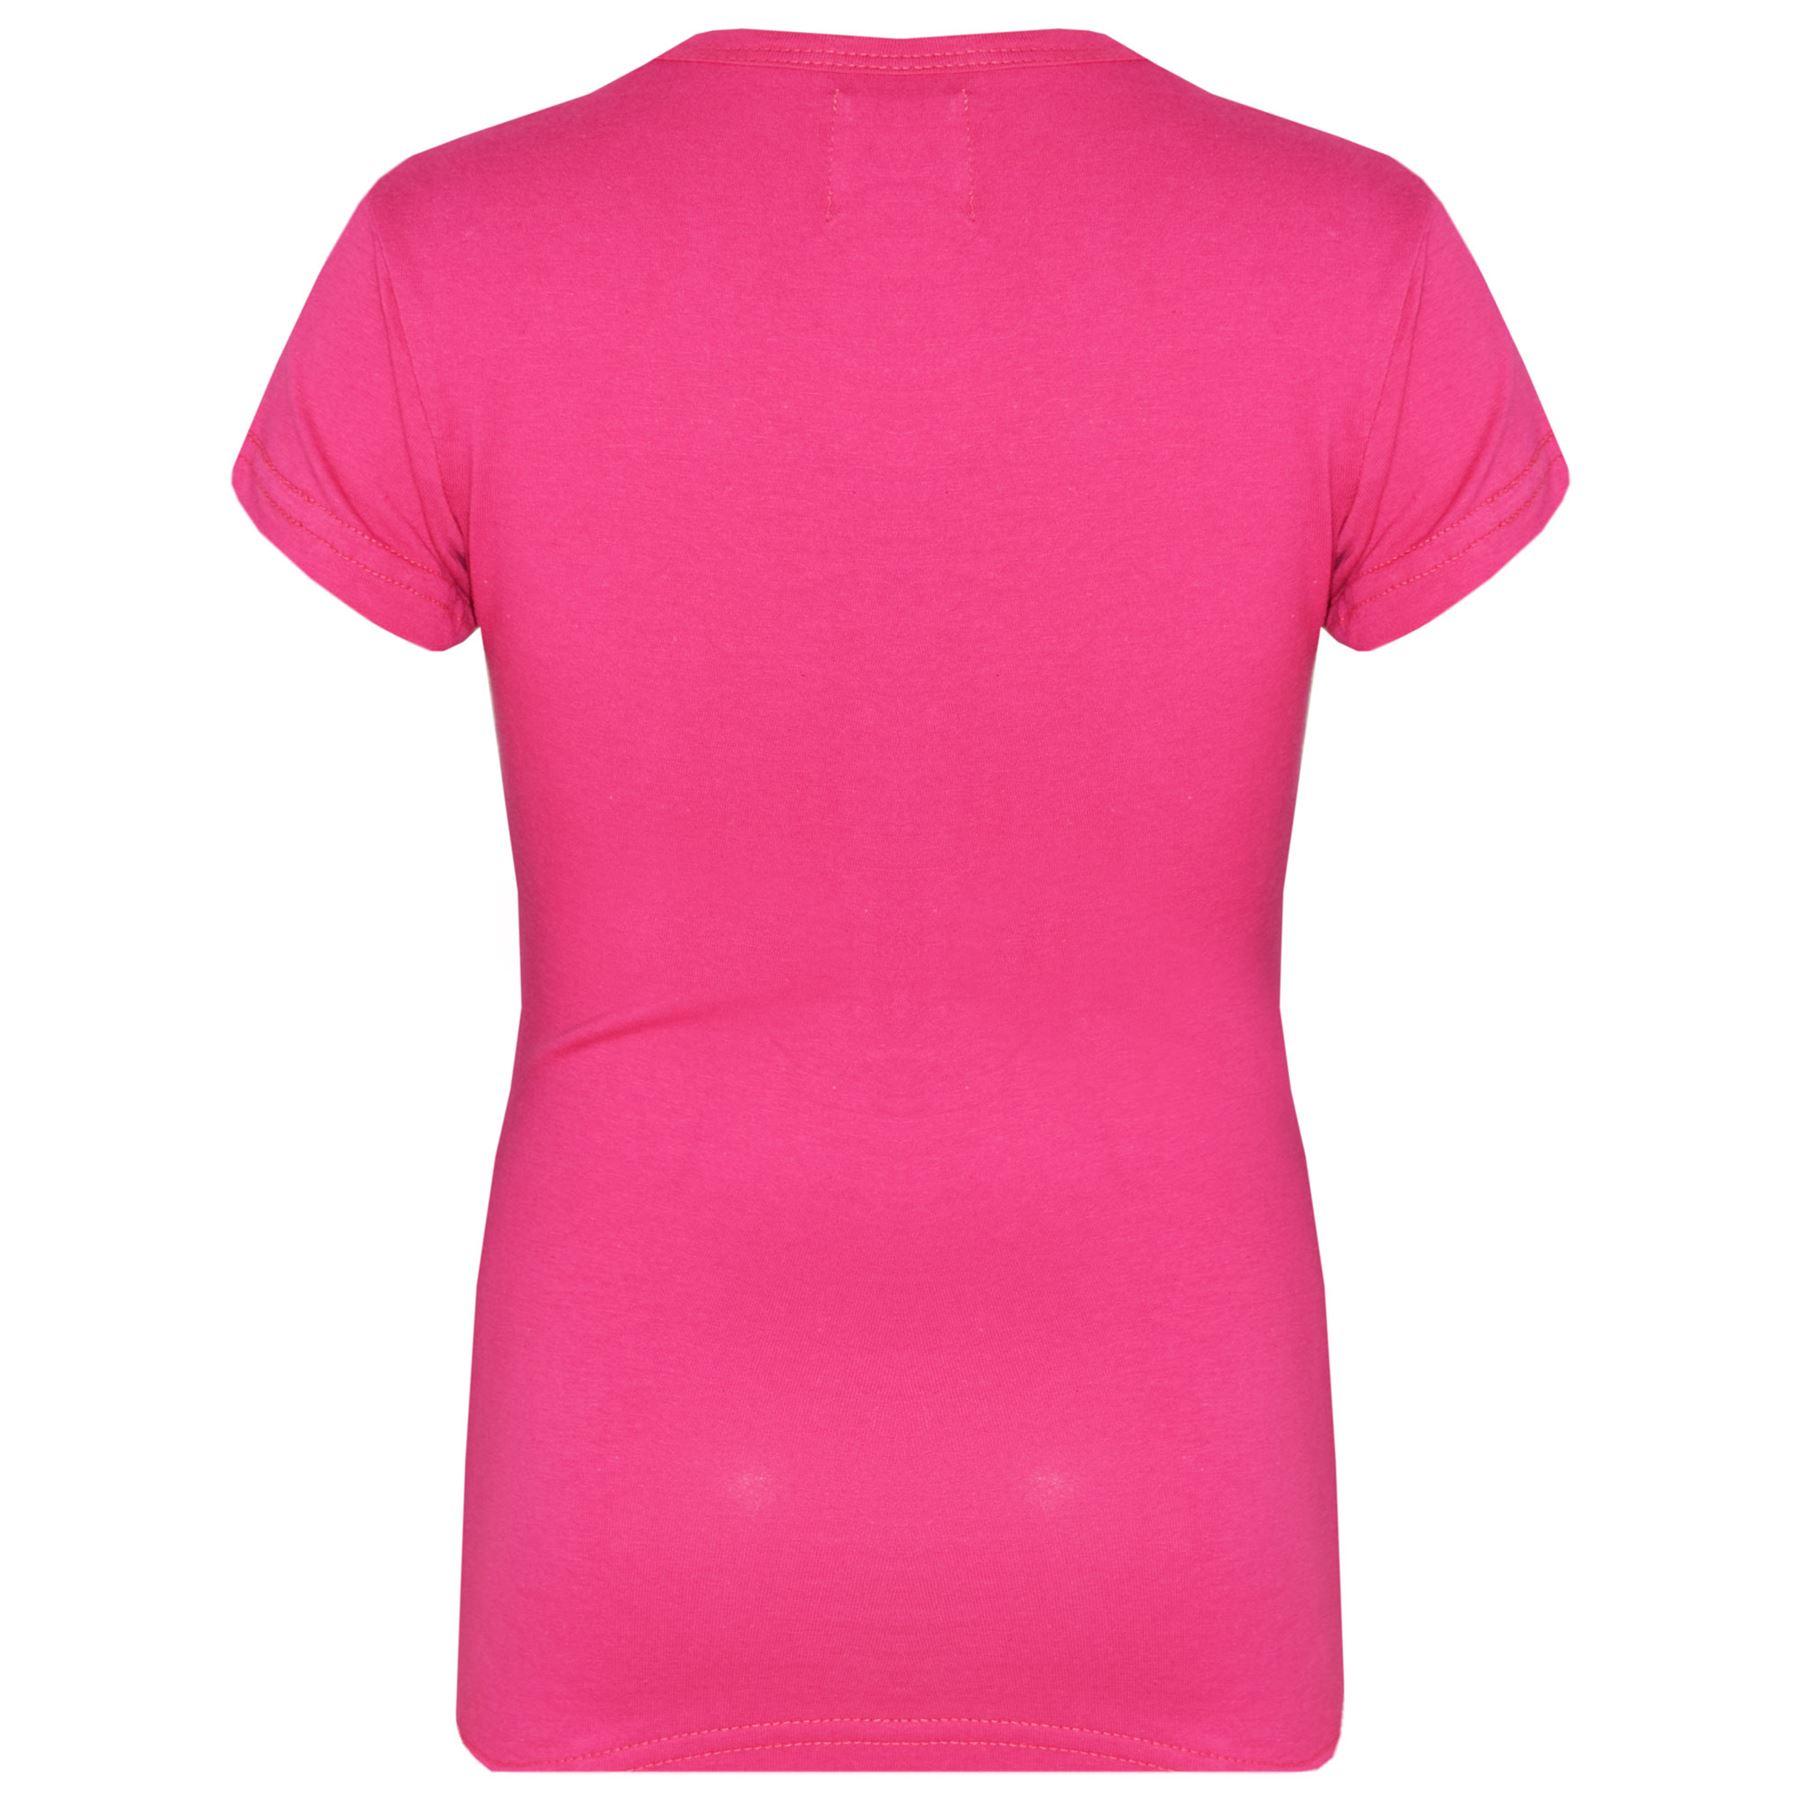 Kids Girls T Shirts Designer 100/% Cotton Plain School T-Shirt Top New Age 3-13Yr